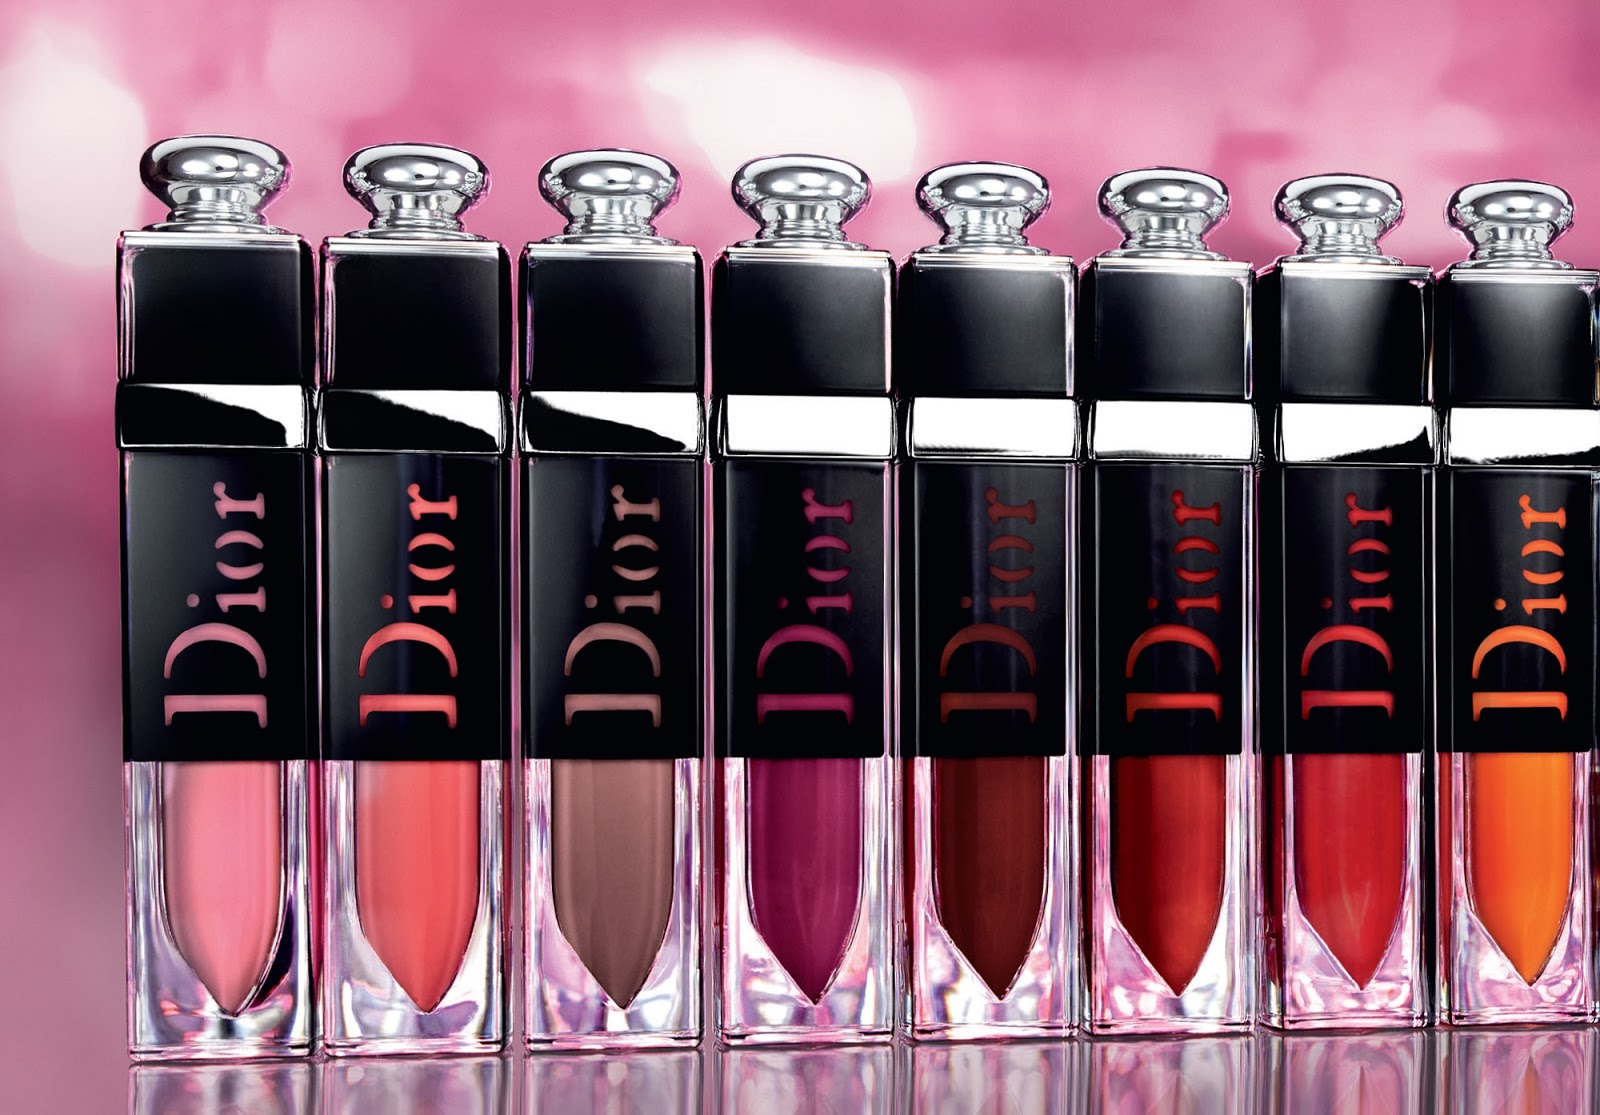 dior-addict-lacquer-plump